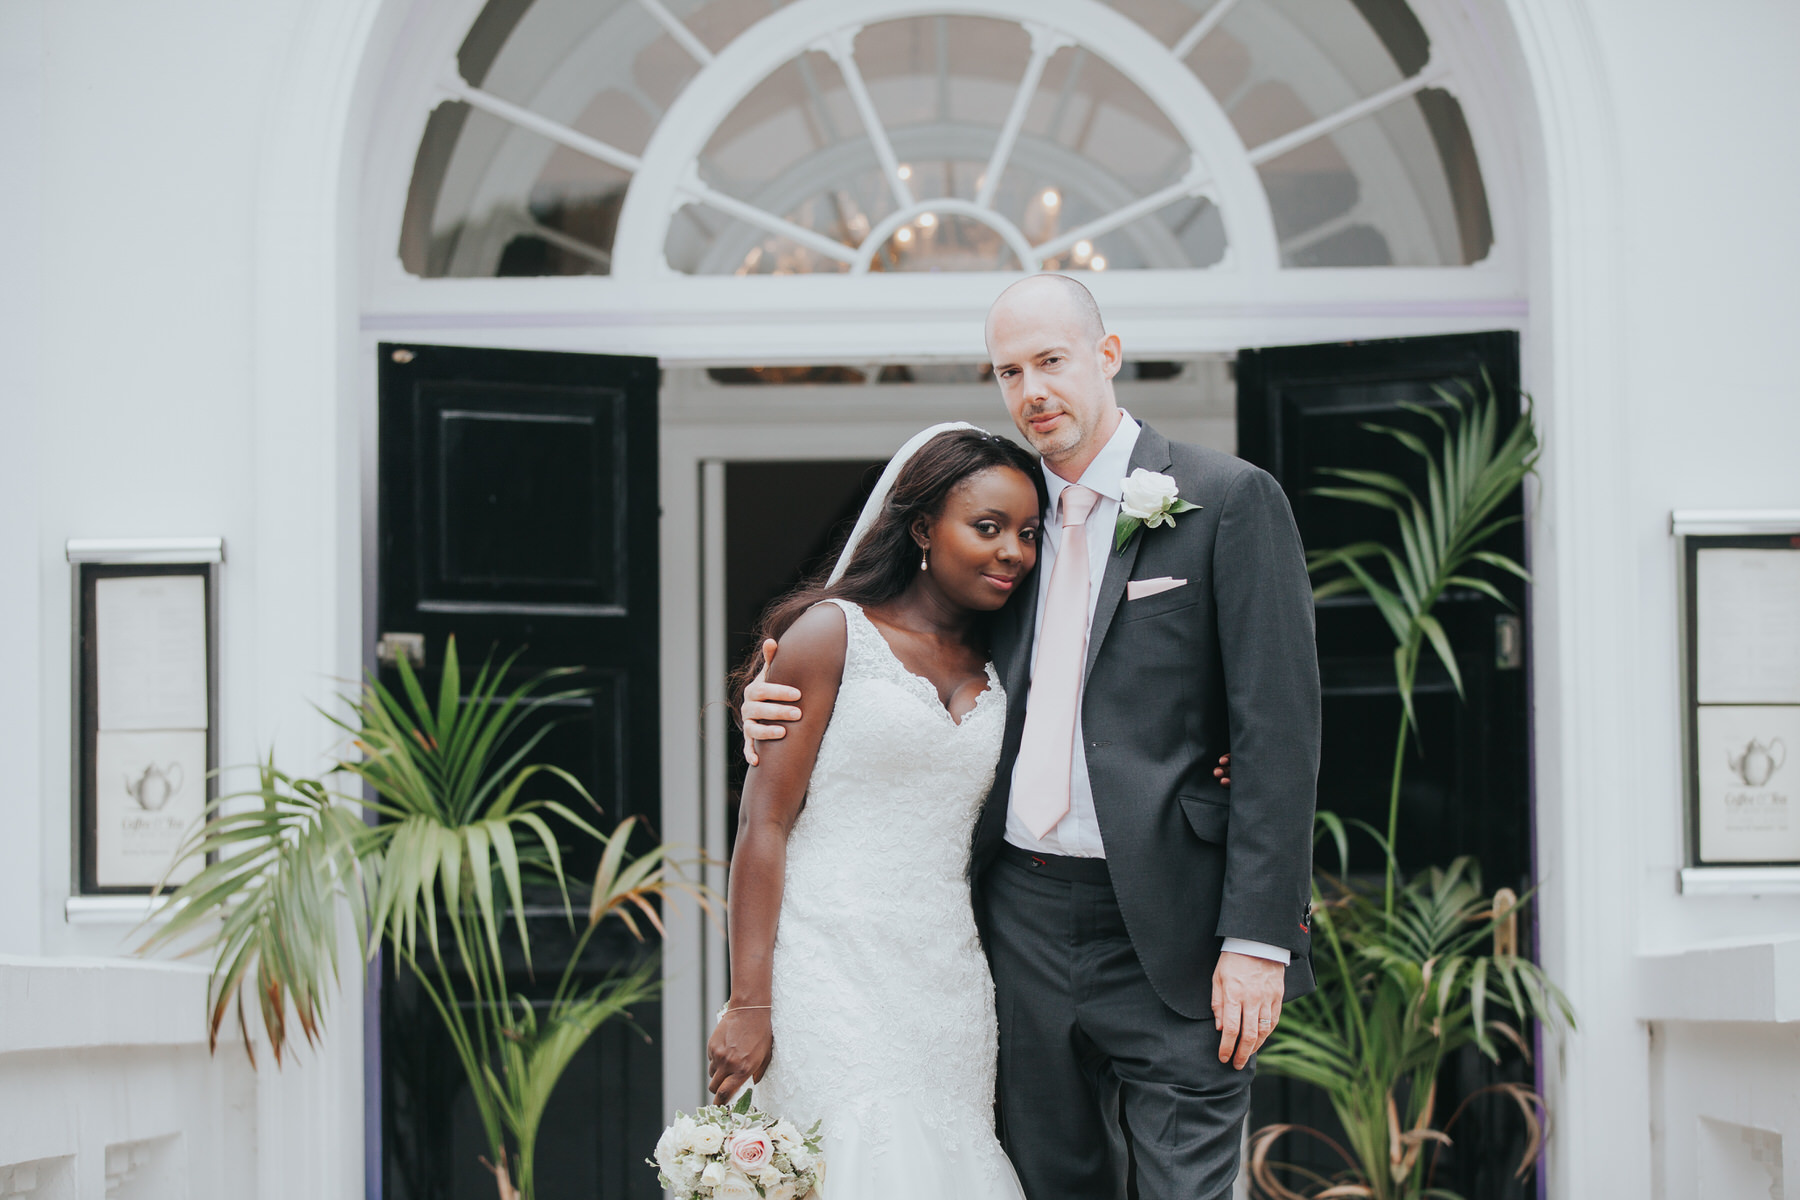 163-Belair House Dulwich groom bride wedding portraits.jpg